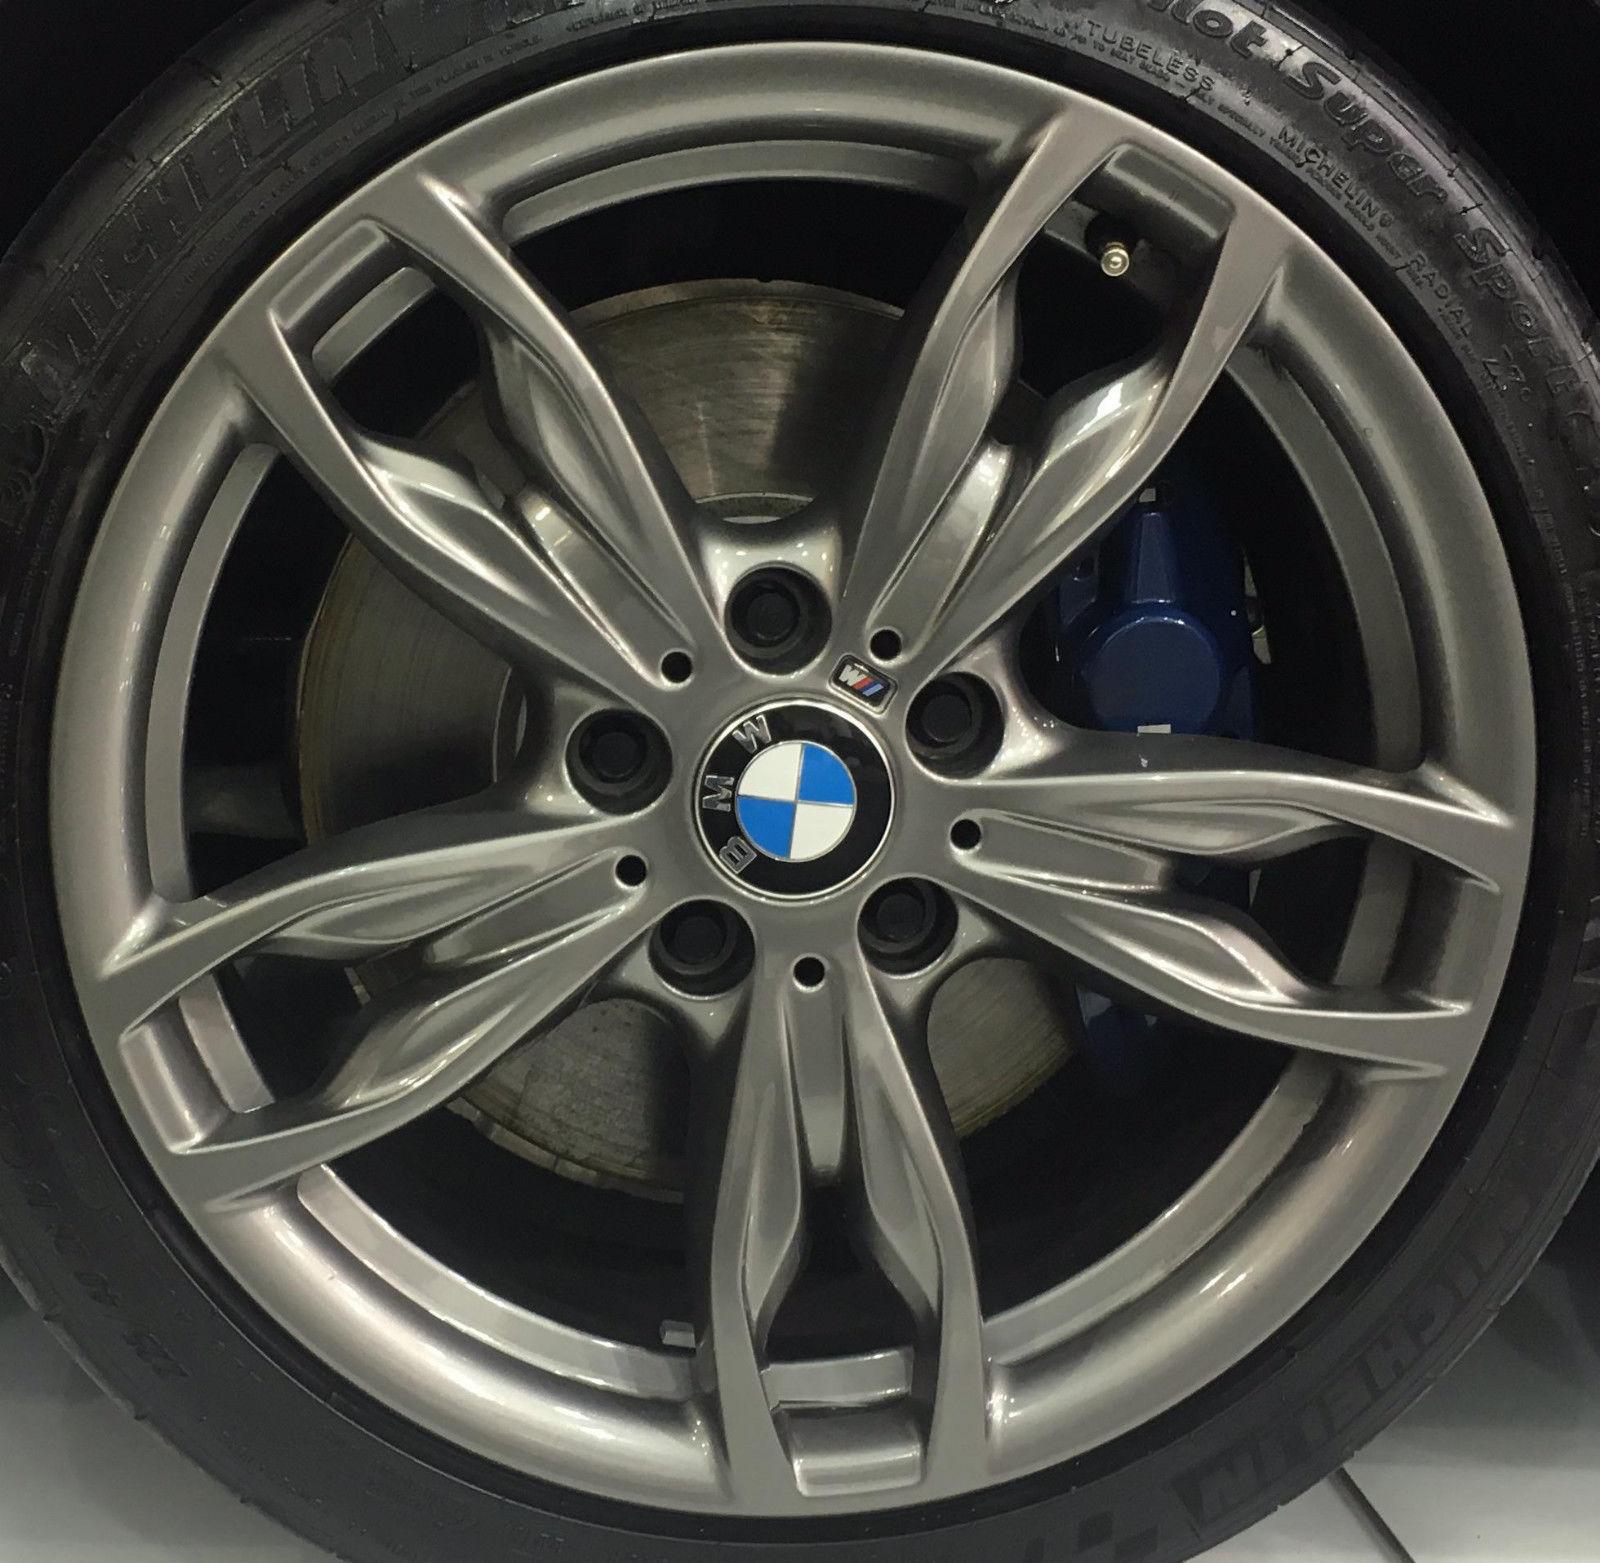 Bmw Ferric Grey Metallic 24 00 16 Wp 24 00 16 163 15 51